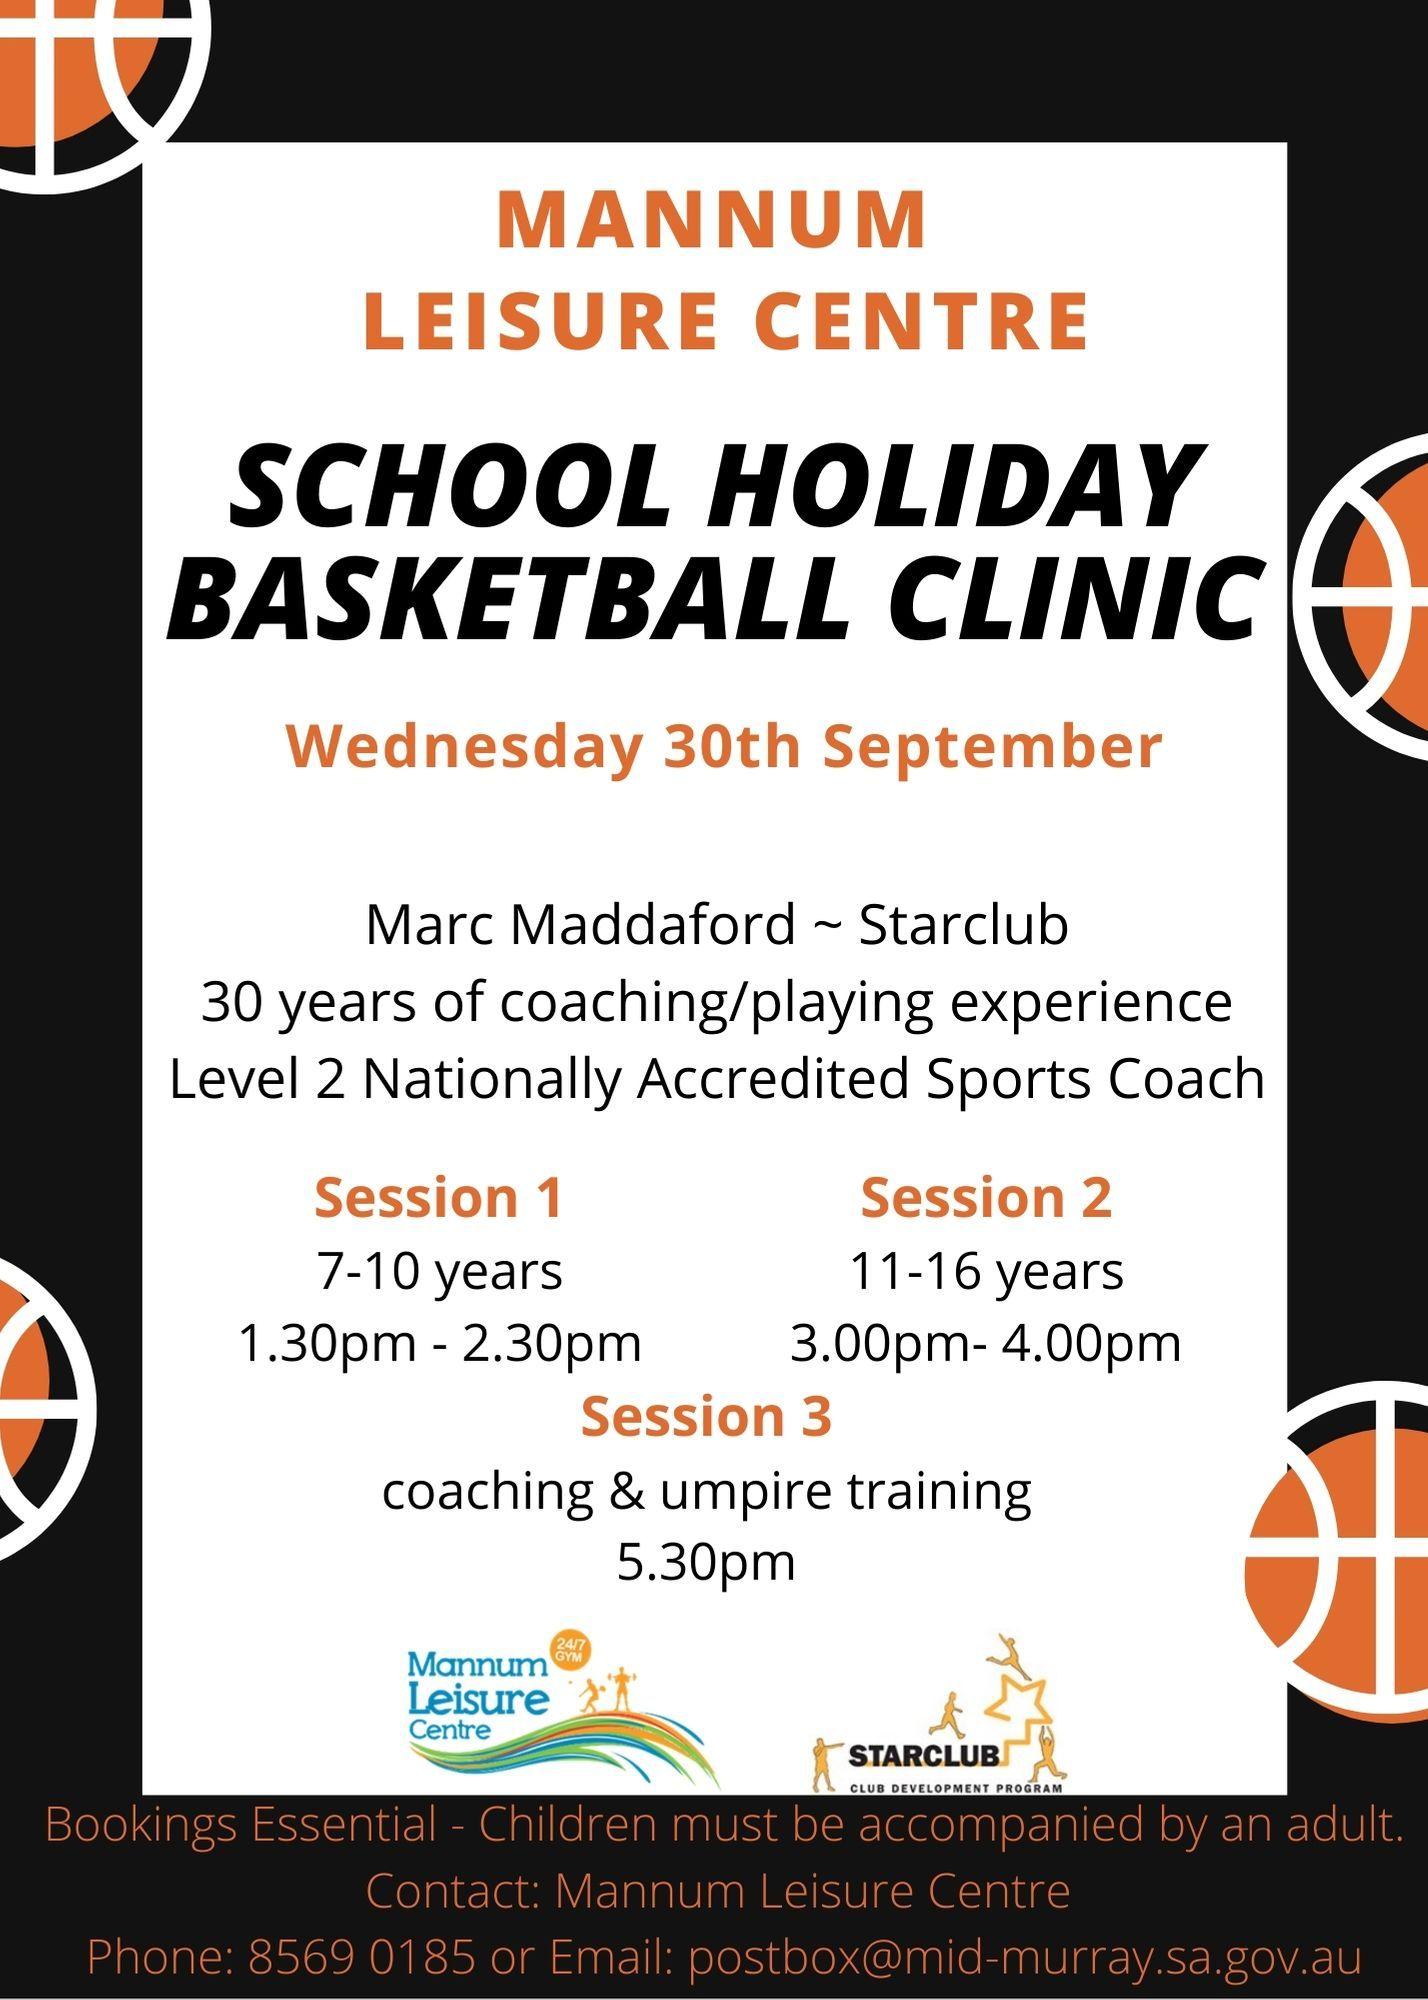 School Holiday Basketball Clinic